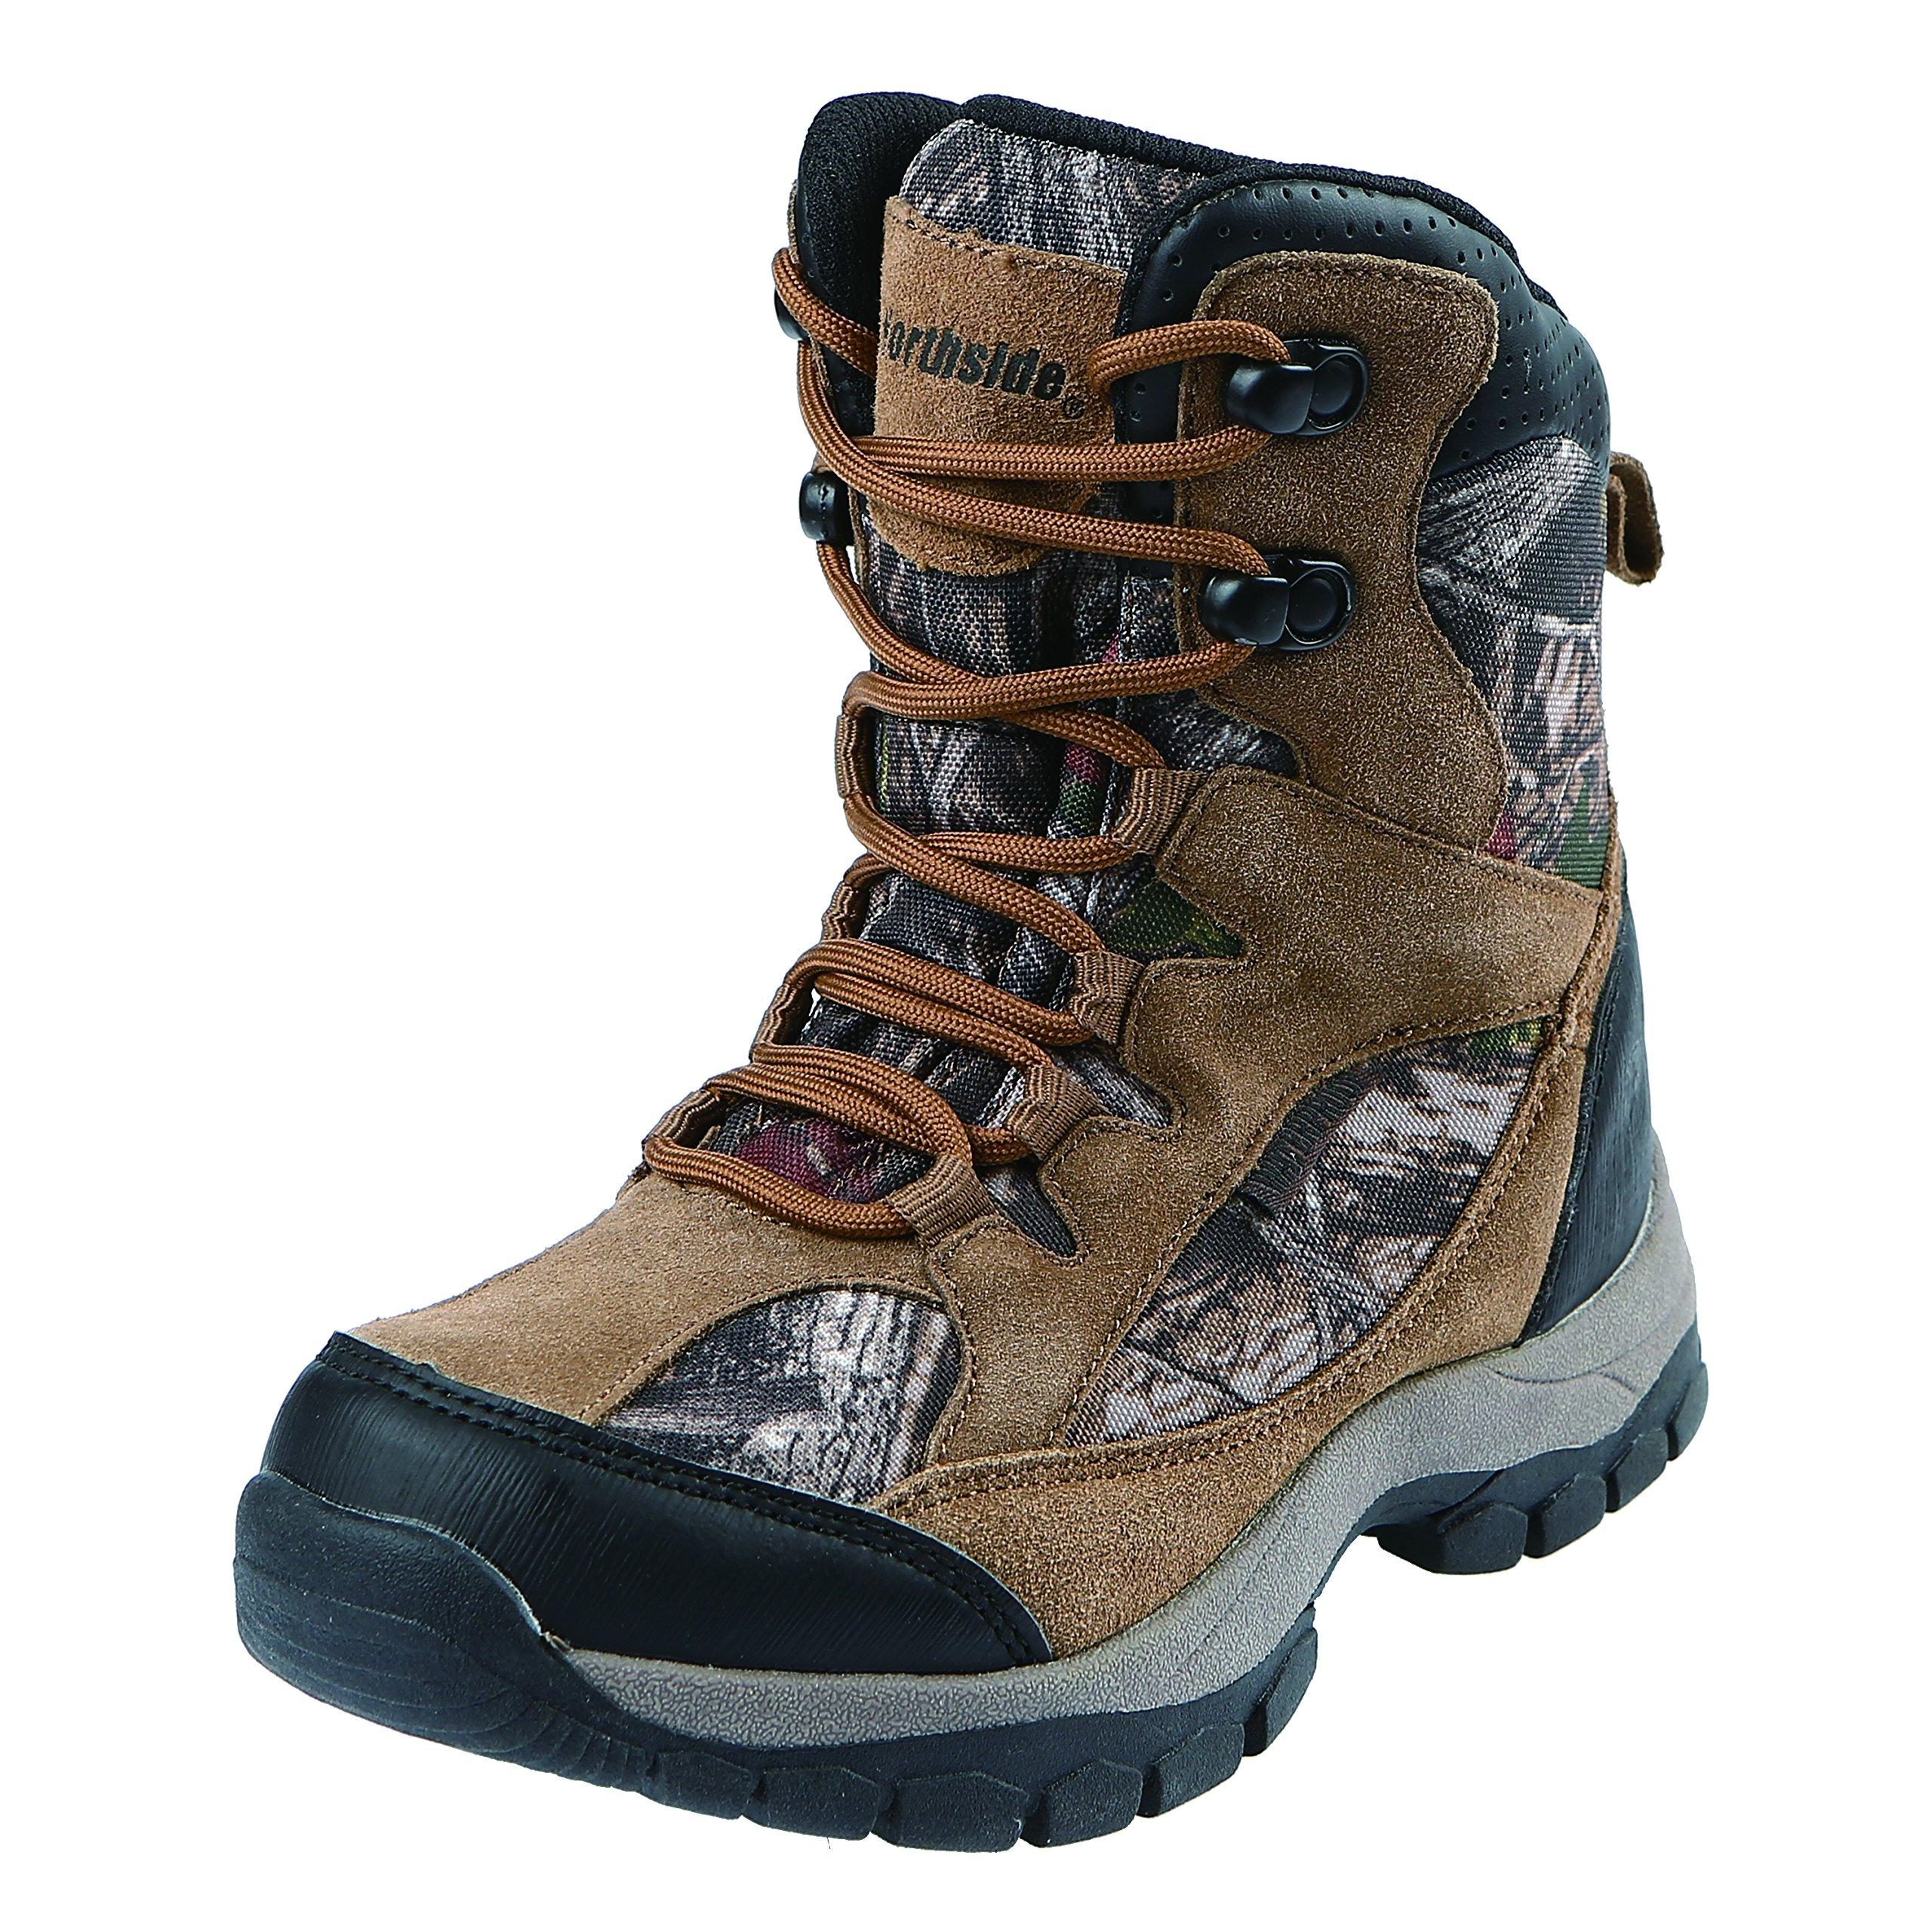 Northside Boys' Renegade 400 Hiking Boot, Tan Camo, Size 3 Medium US Little Kid